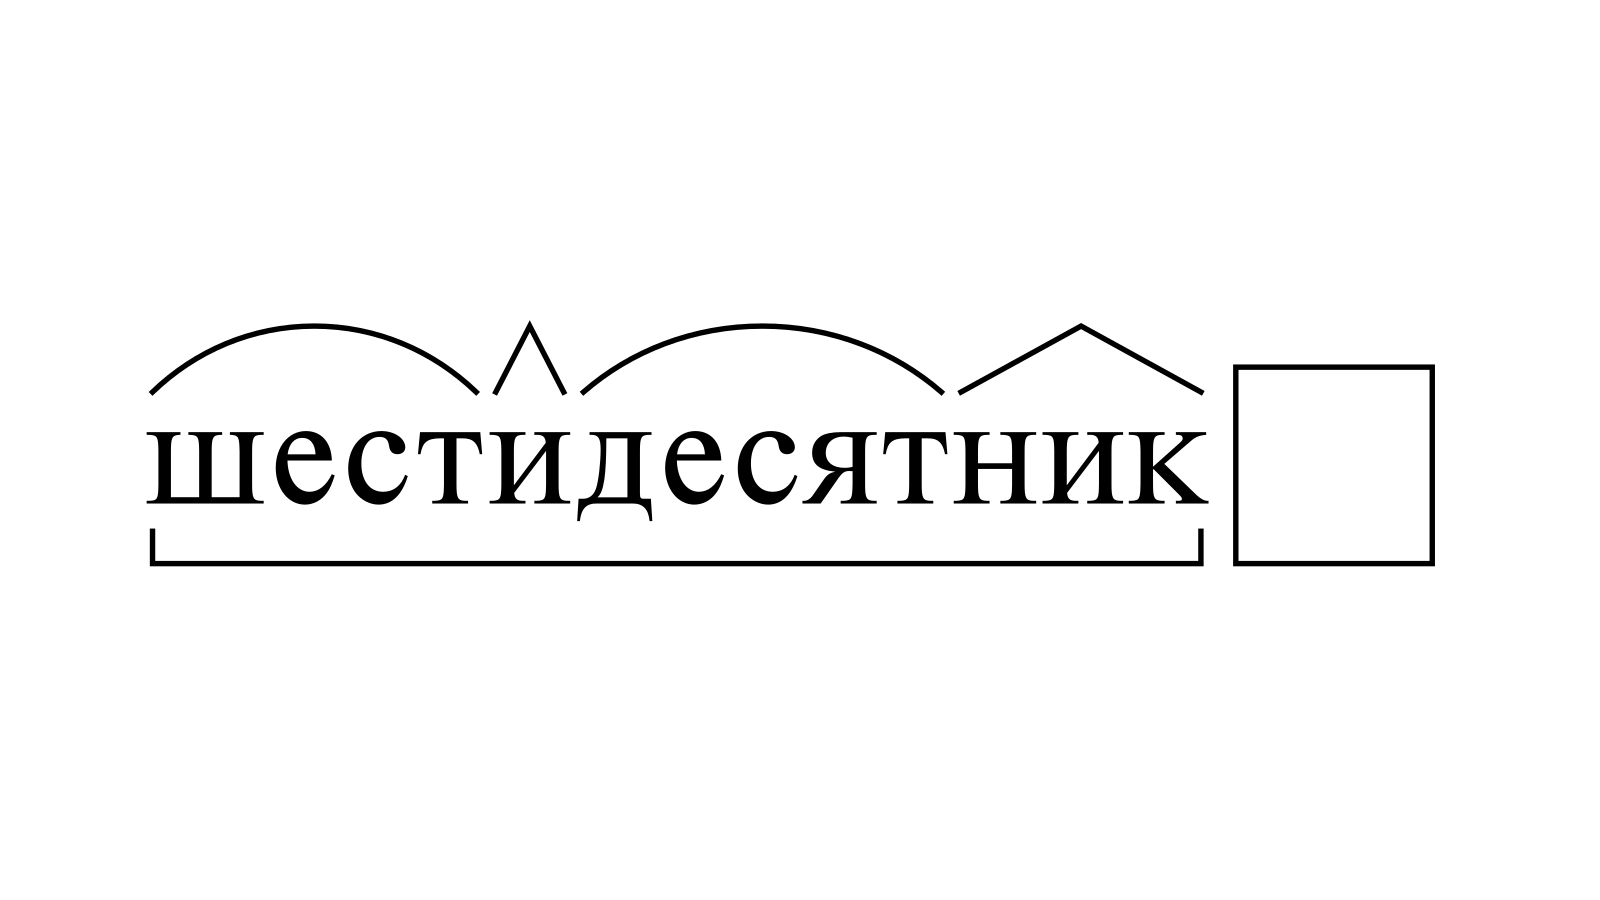 Разбор слова «шестидесятник» по составу